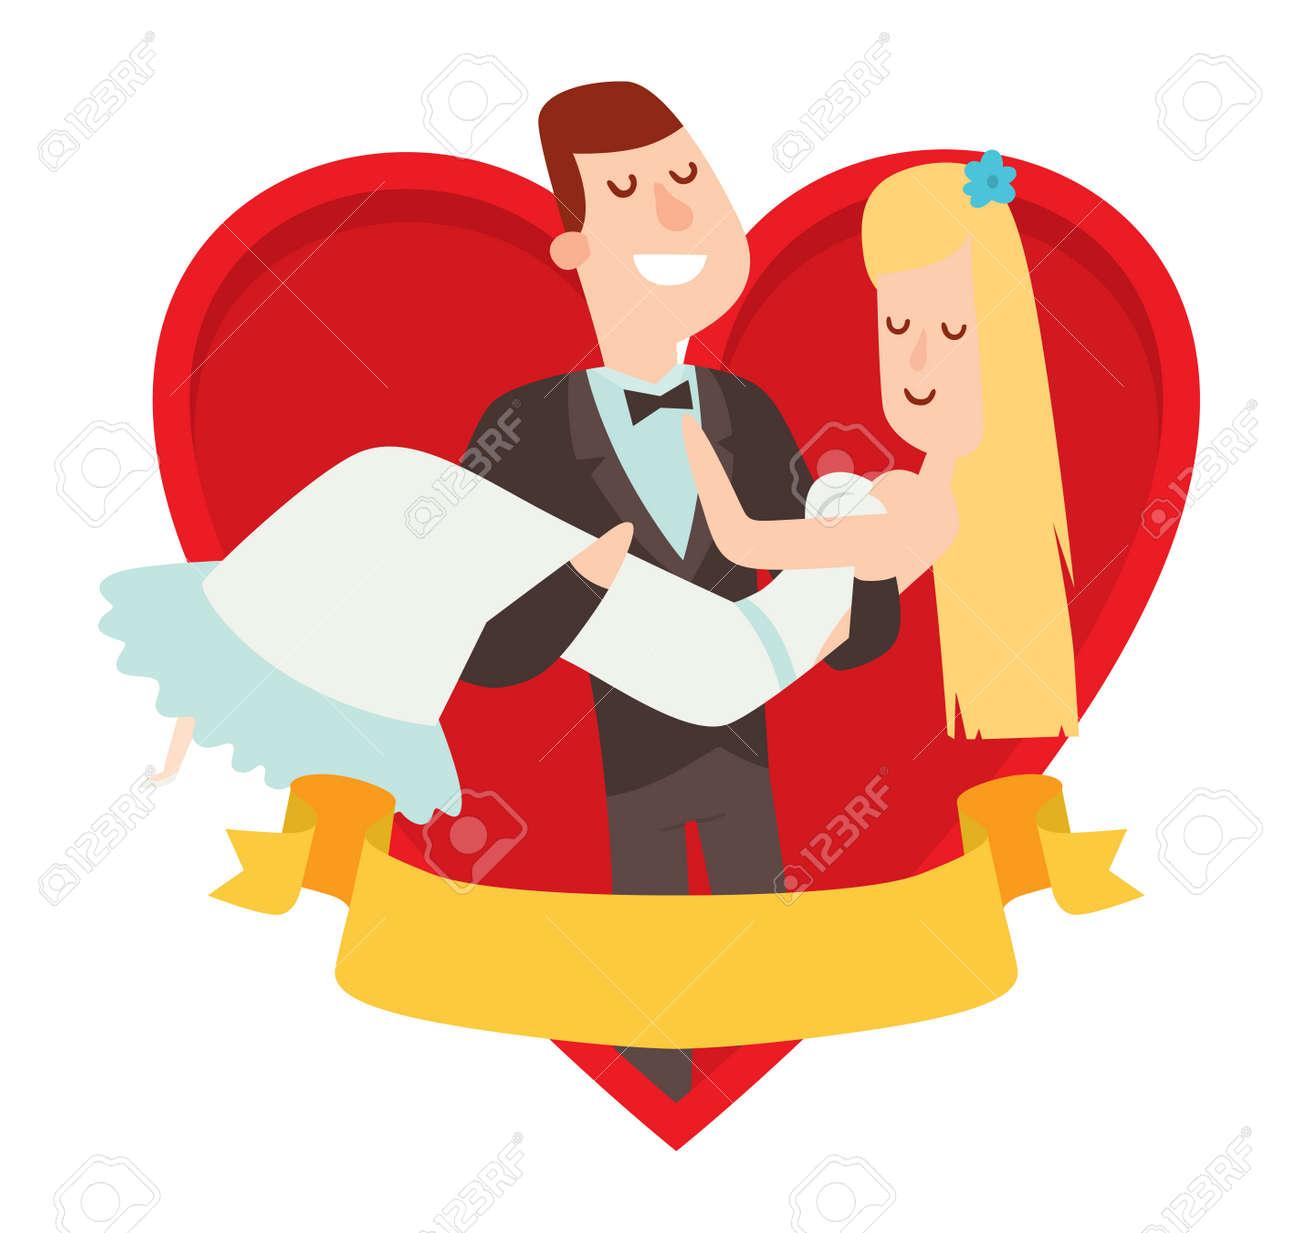 Wedding Couples Cartoon Style Vector Illustration Wedding Couples